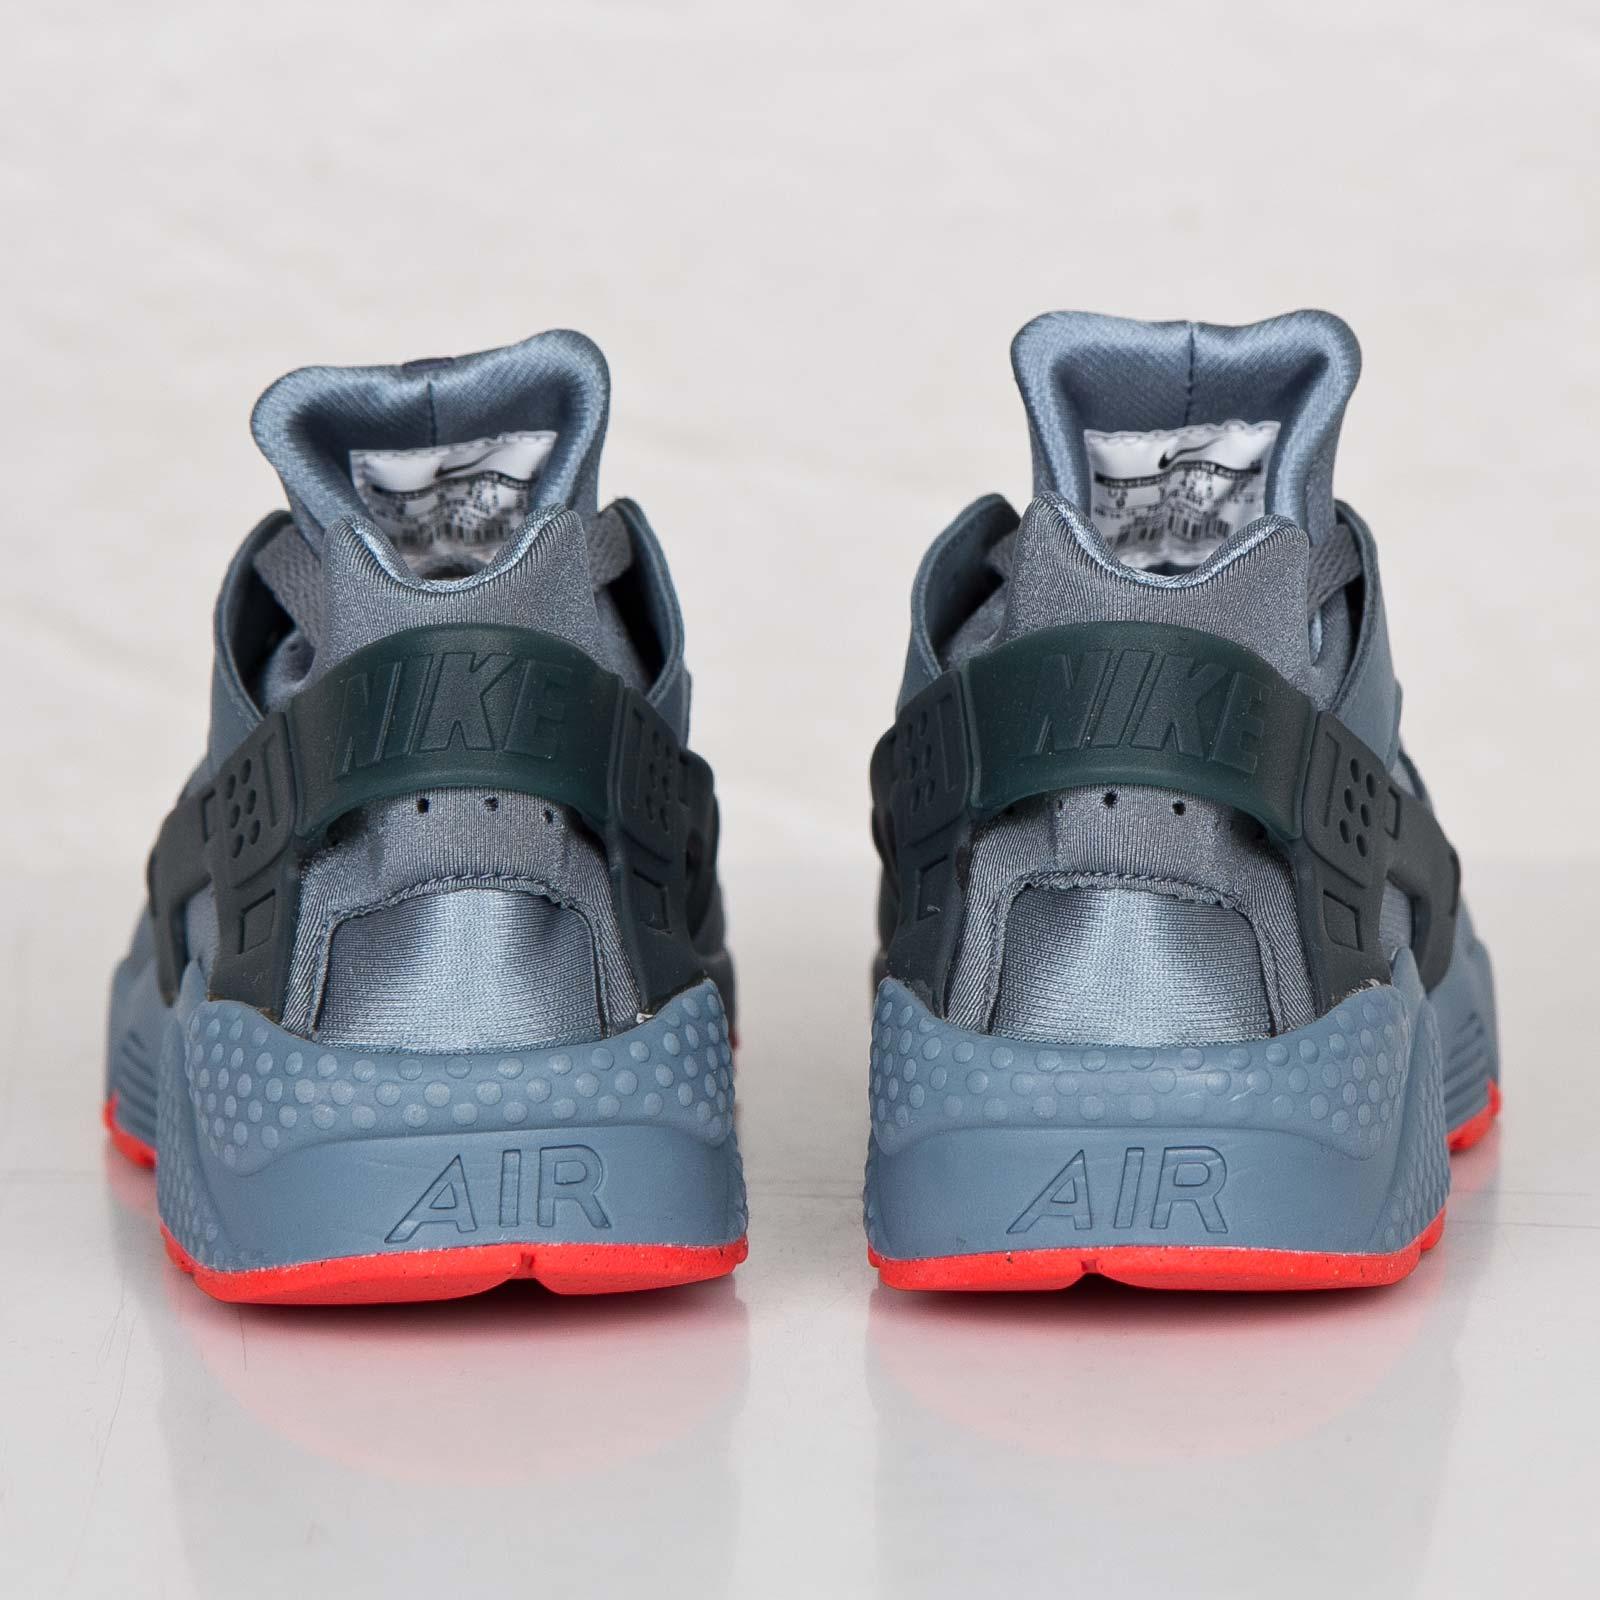 newest 5738e 6b1dc Nike Air Huarache Run FB - 705070-400 - Sneakersnstuff   sneakers    streetwear online since 1999